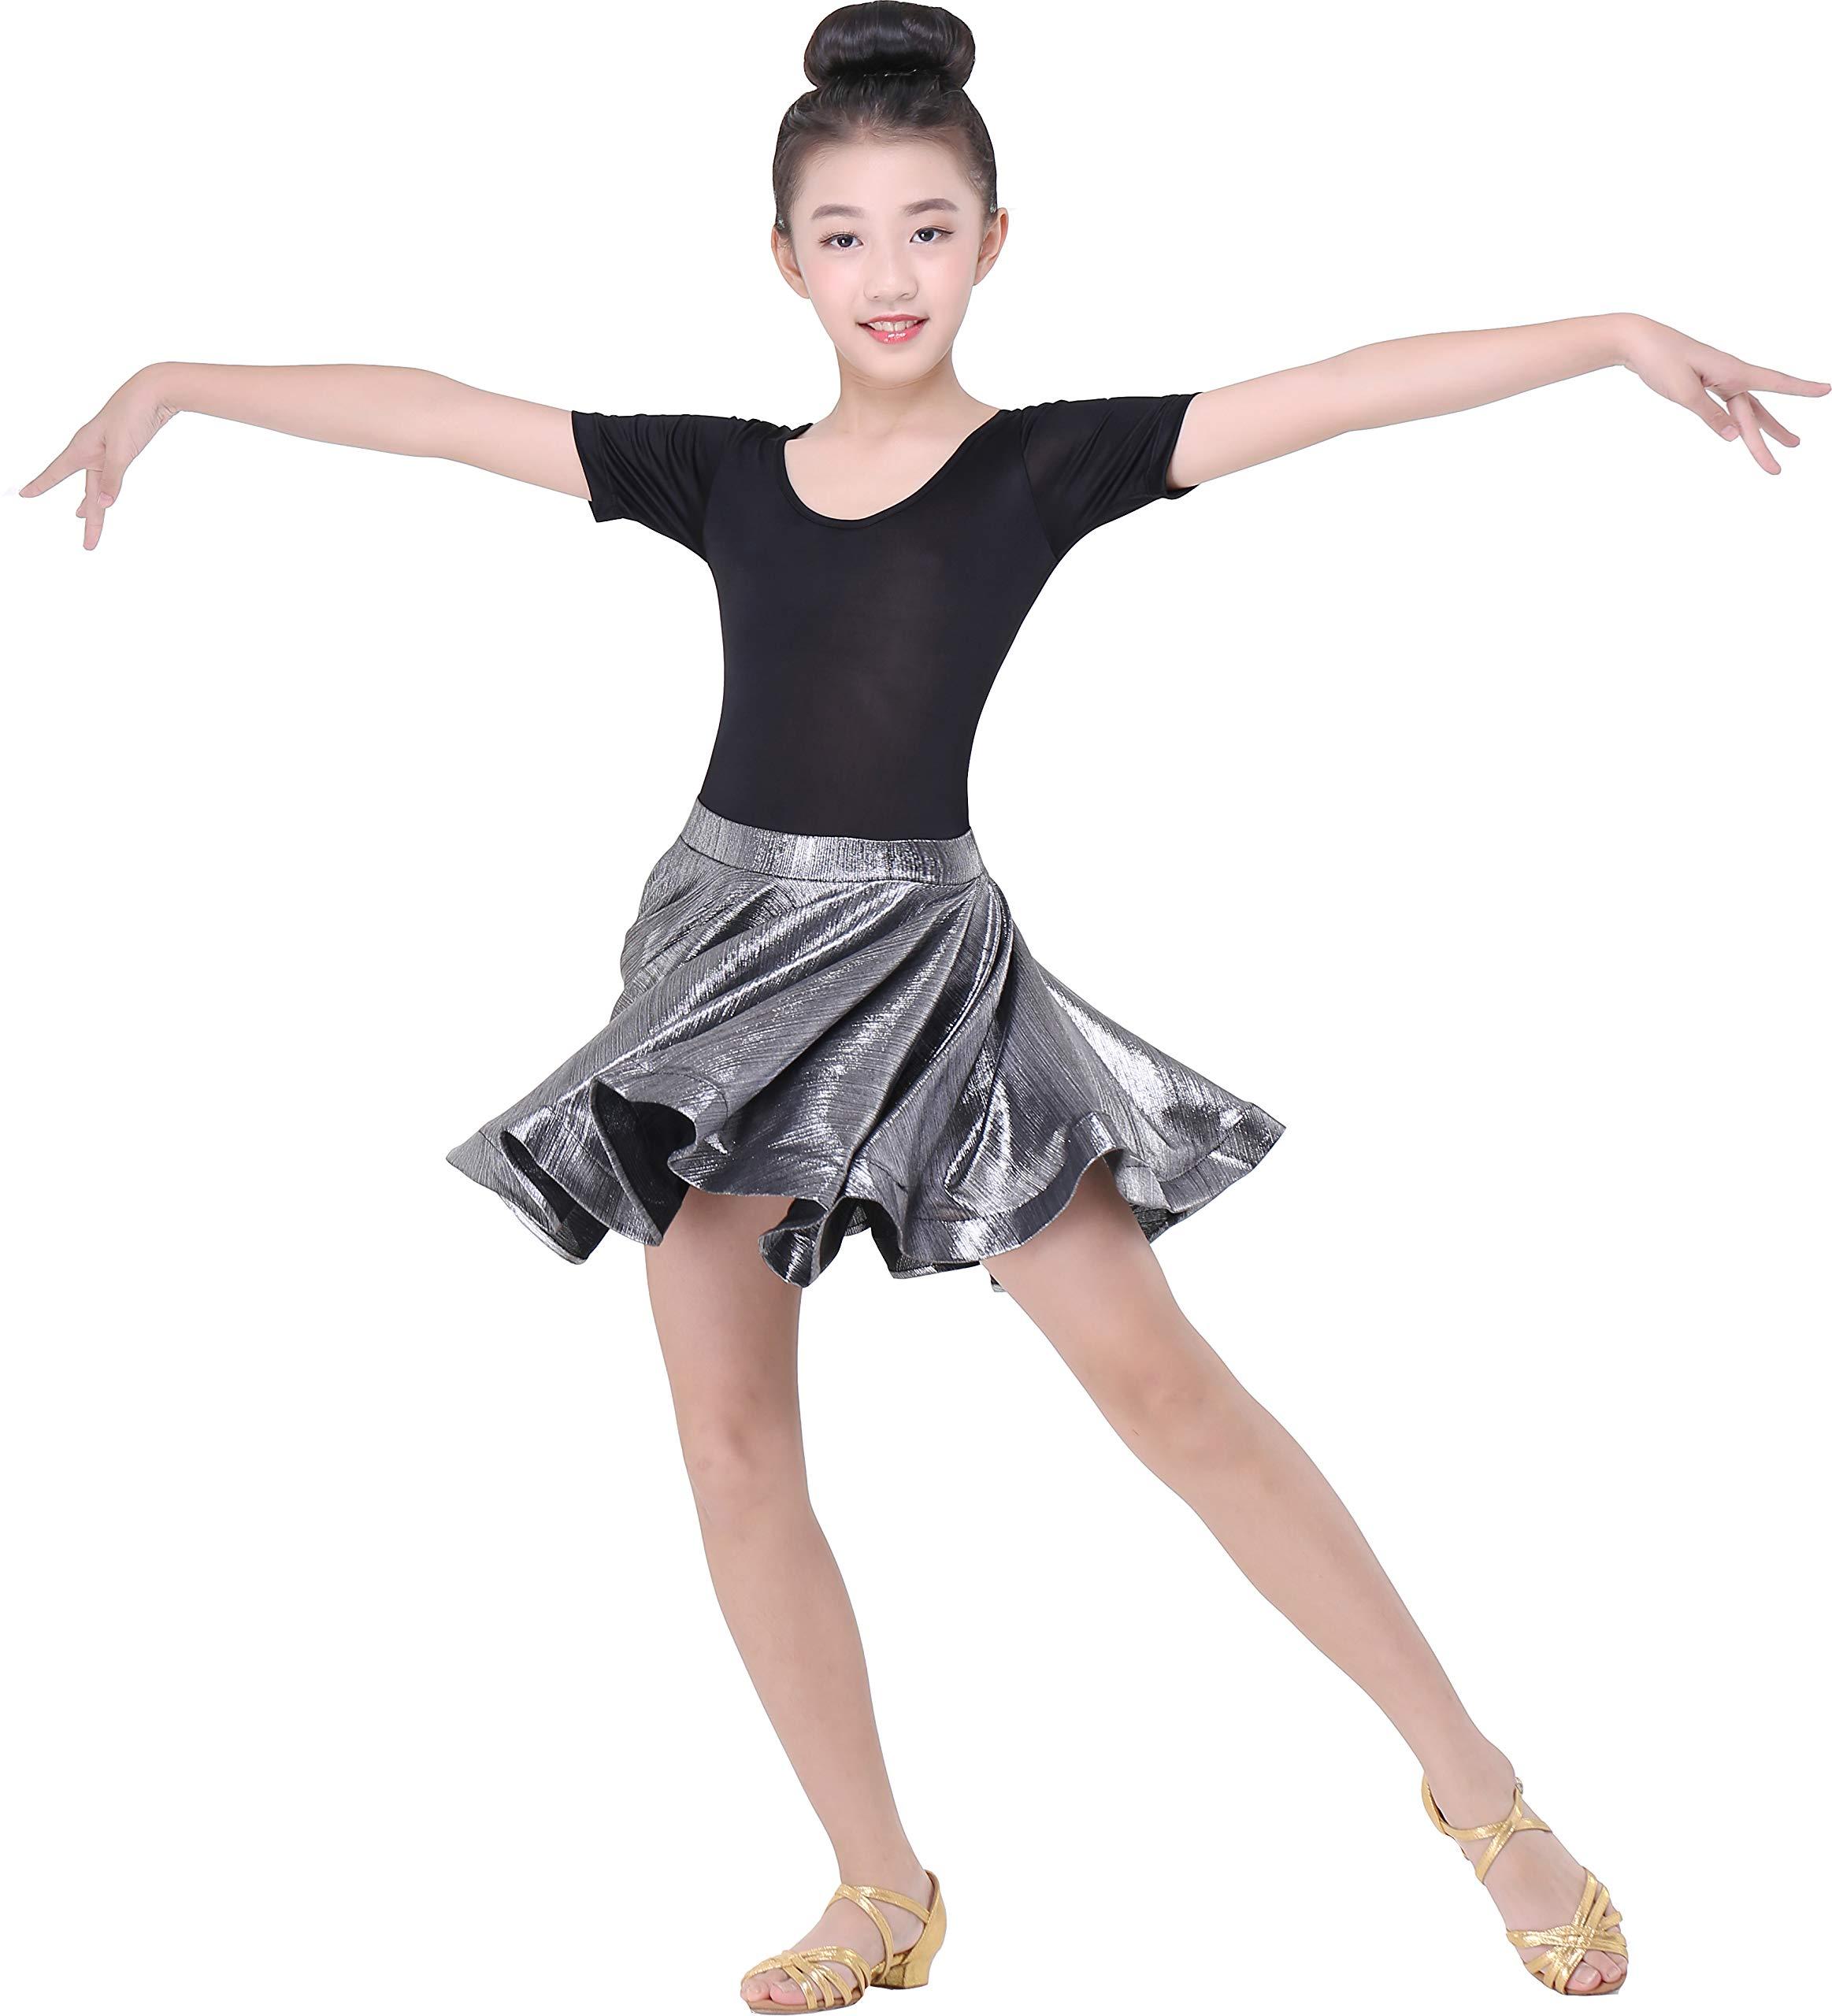 JEZISYMA Girls' Latin Salsa Ballroom Practice Dance Skirt (XS, Silver) by JEZISYMA